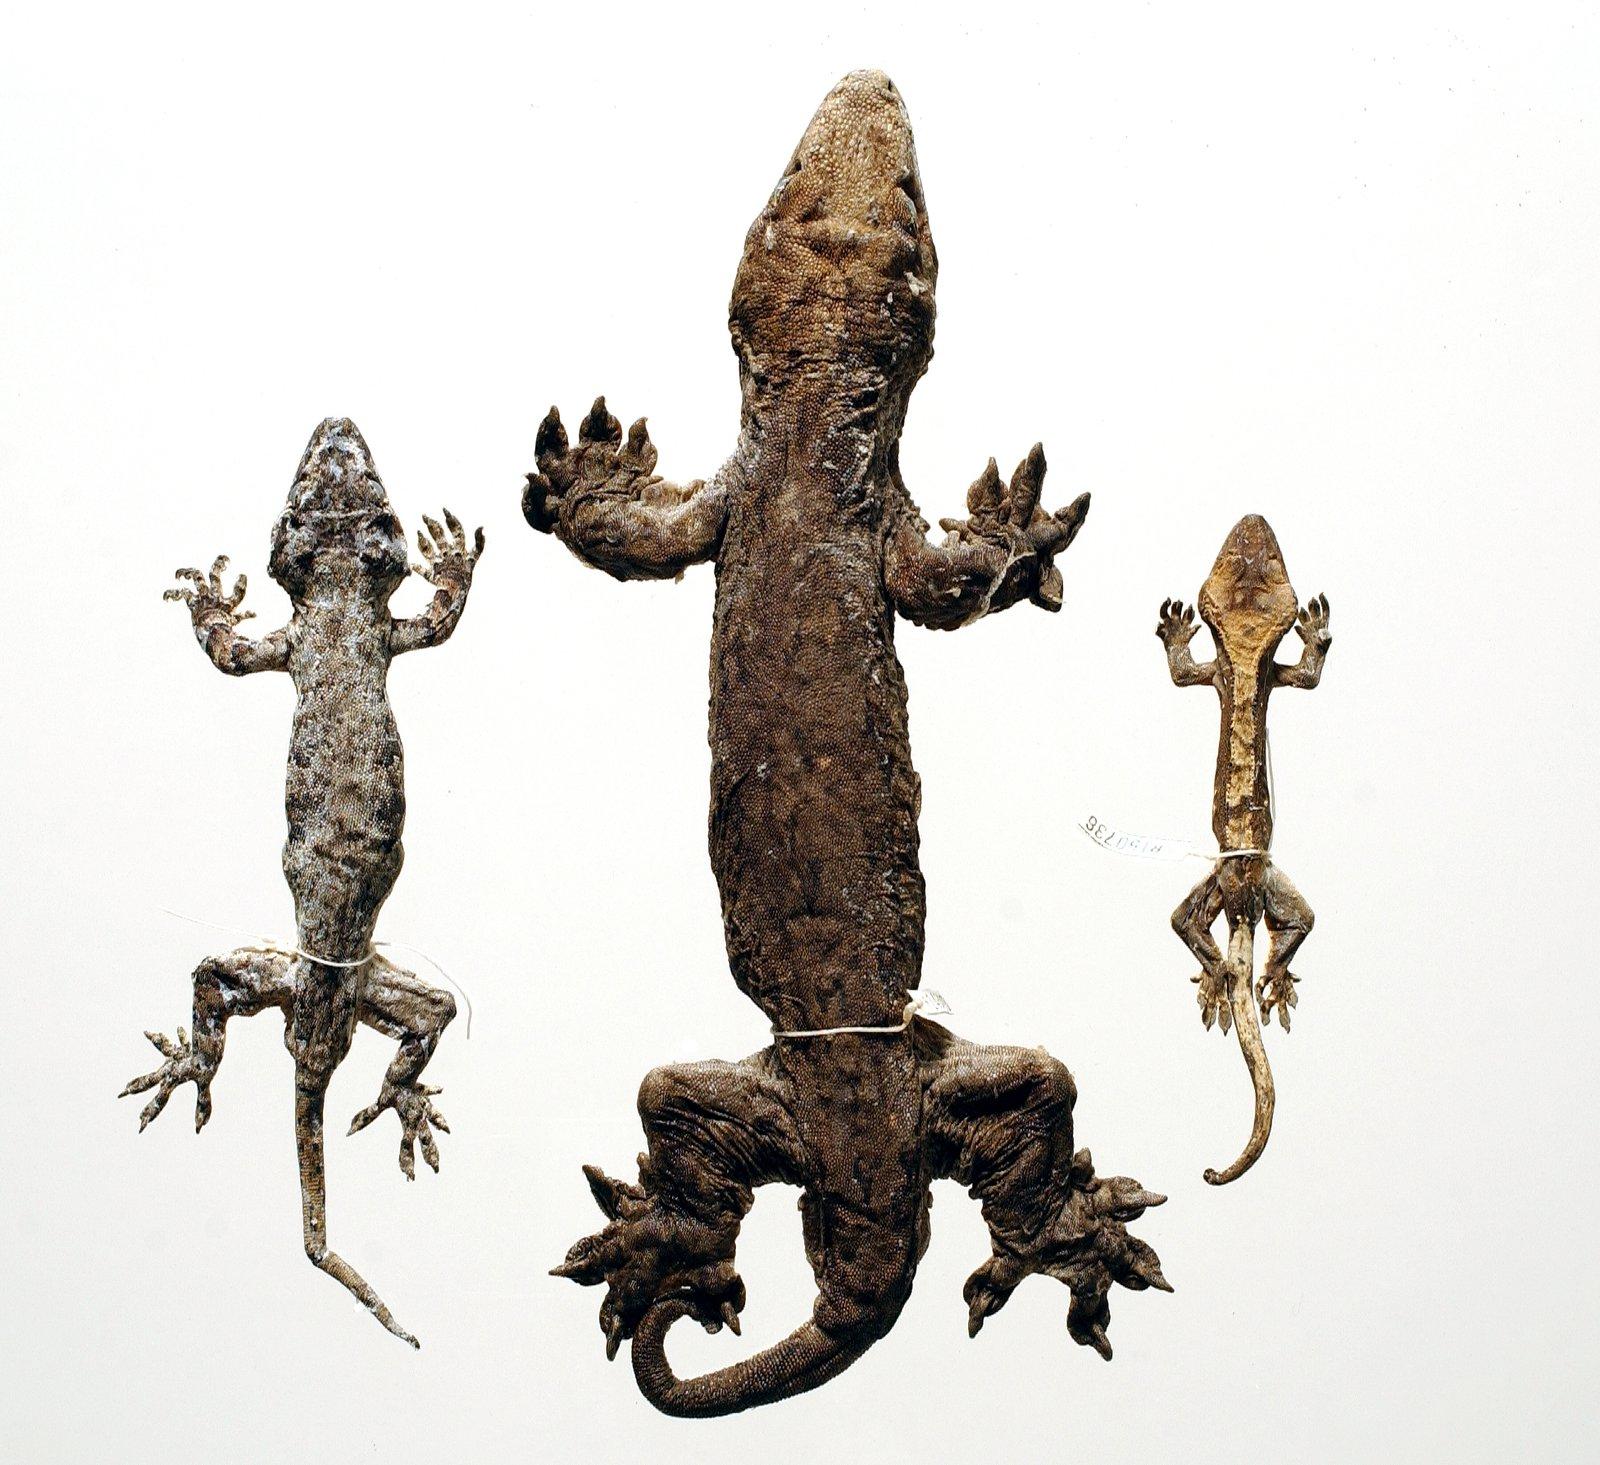 Giant Geckos